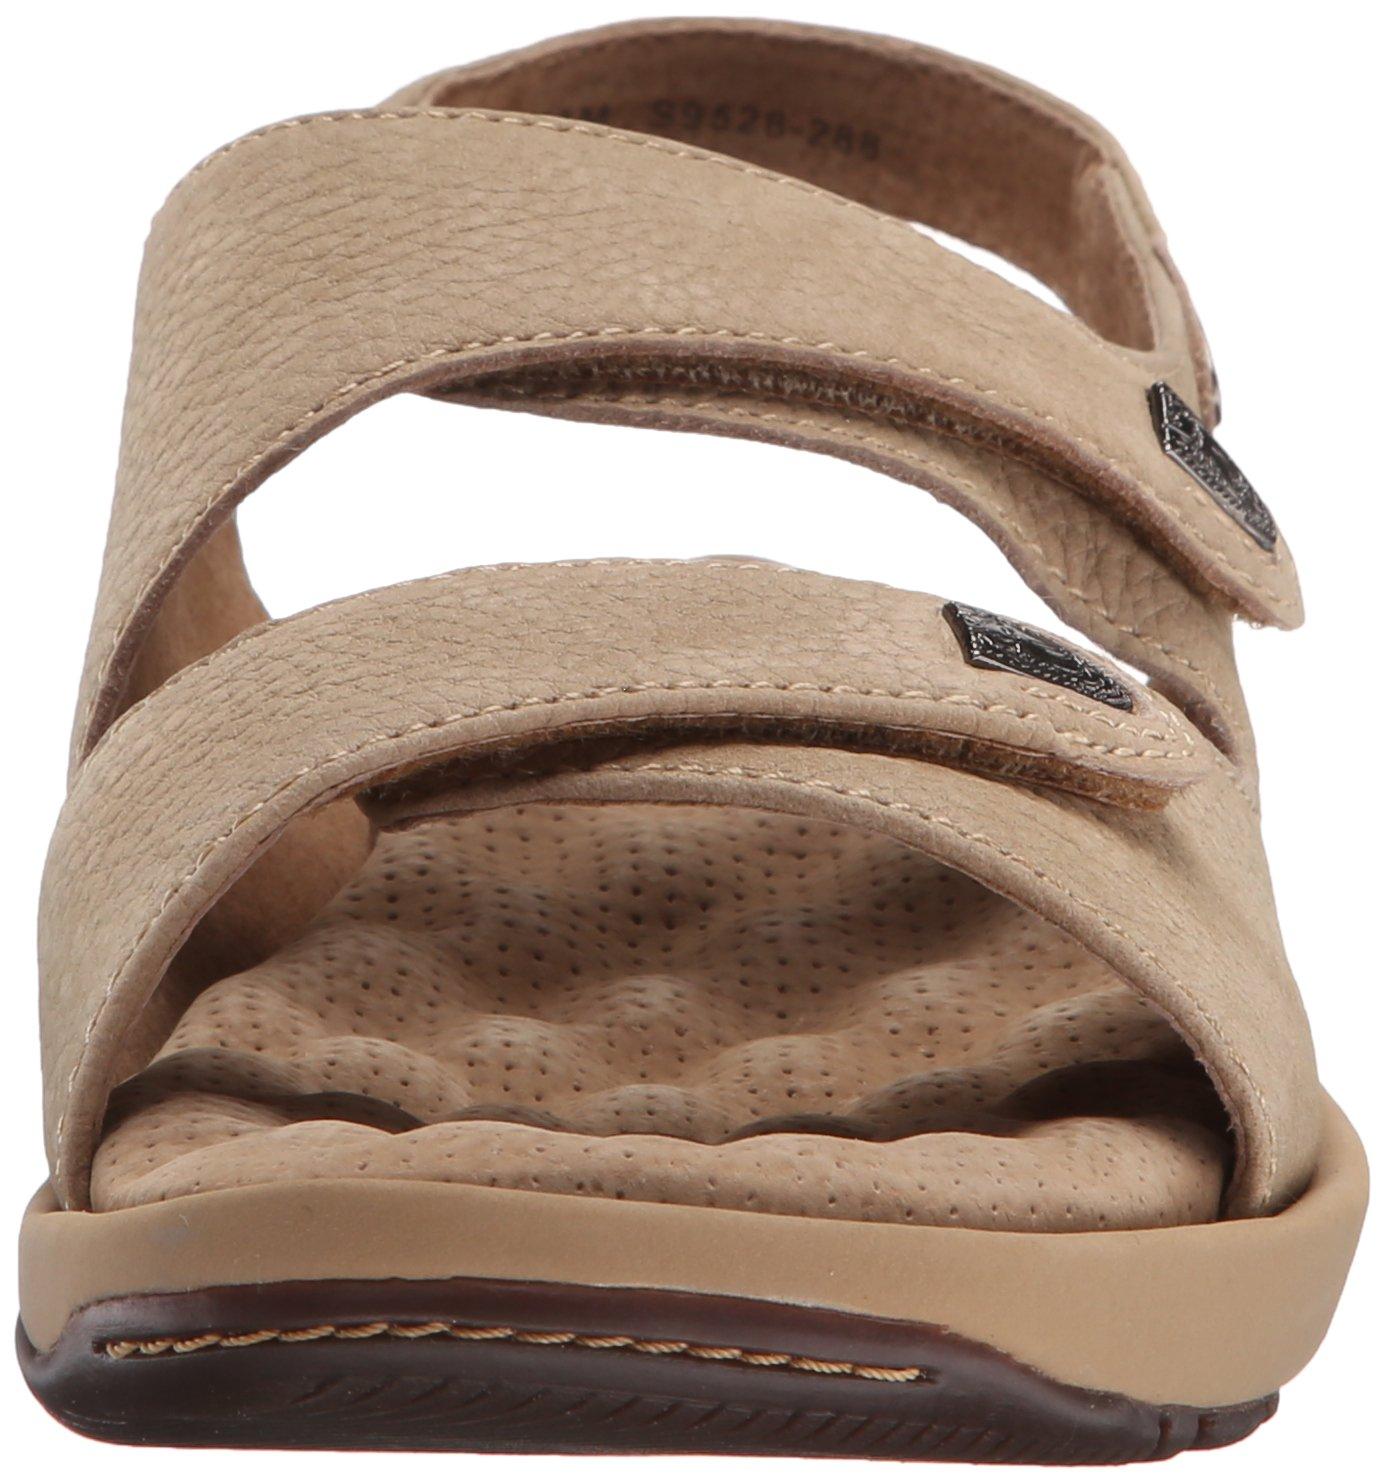 SoftWalk Women's Bolivia Sandal B002J9GYSM 9.5 XW US|Sand Tumbled Nubuck